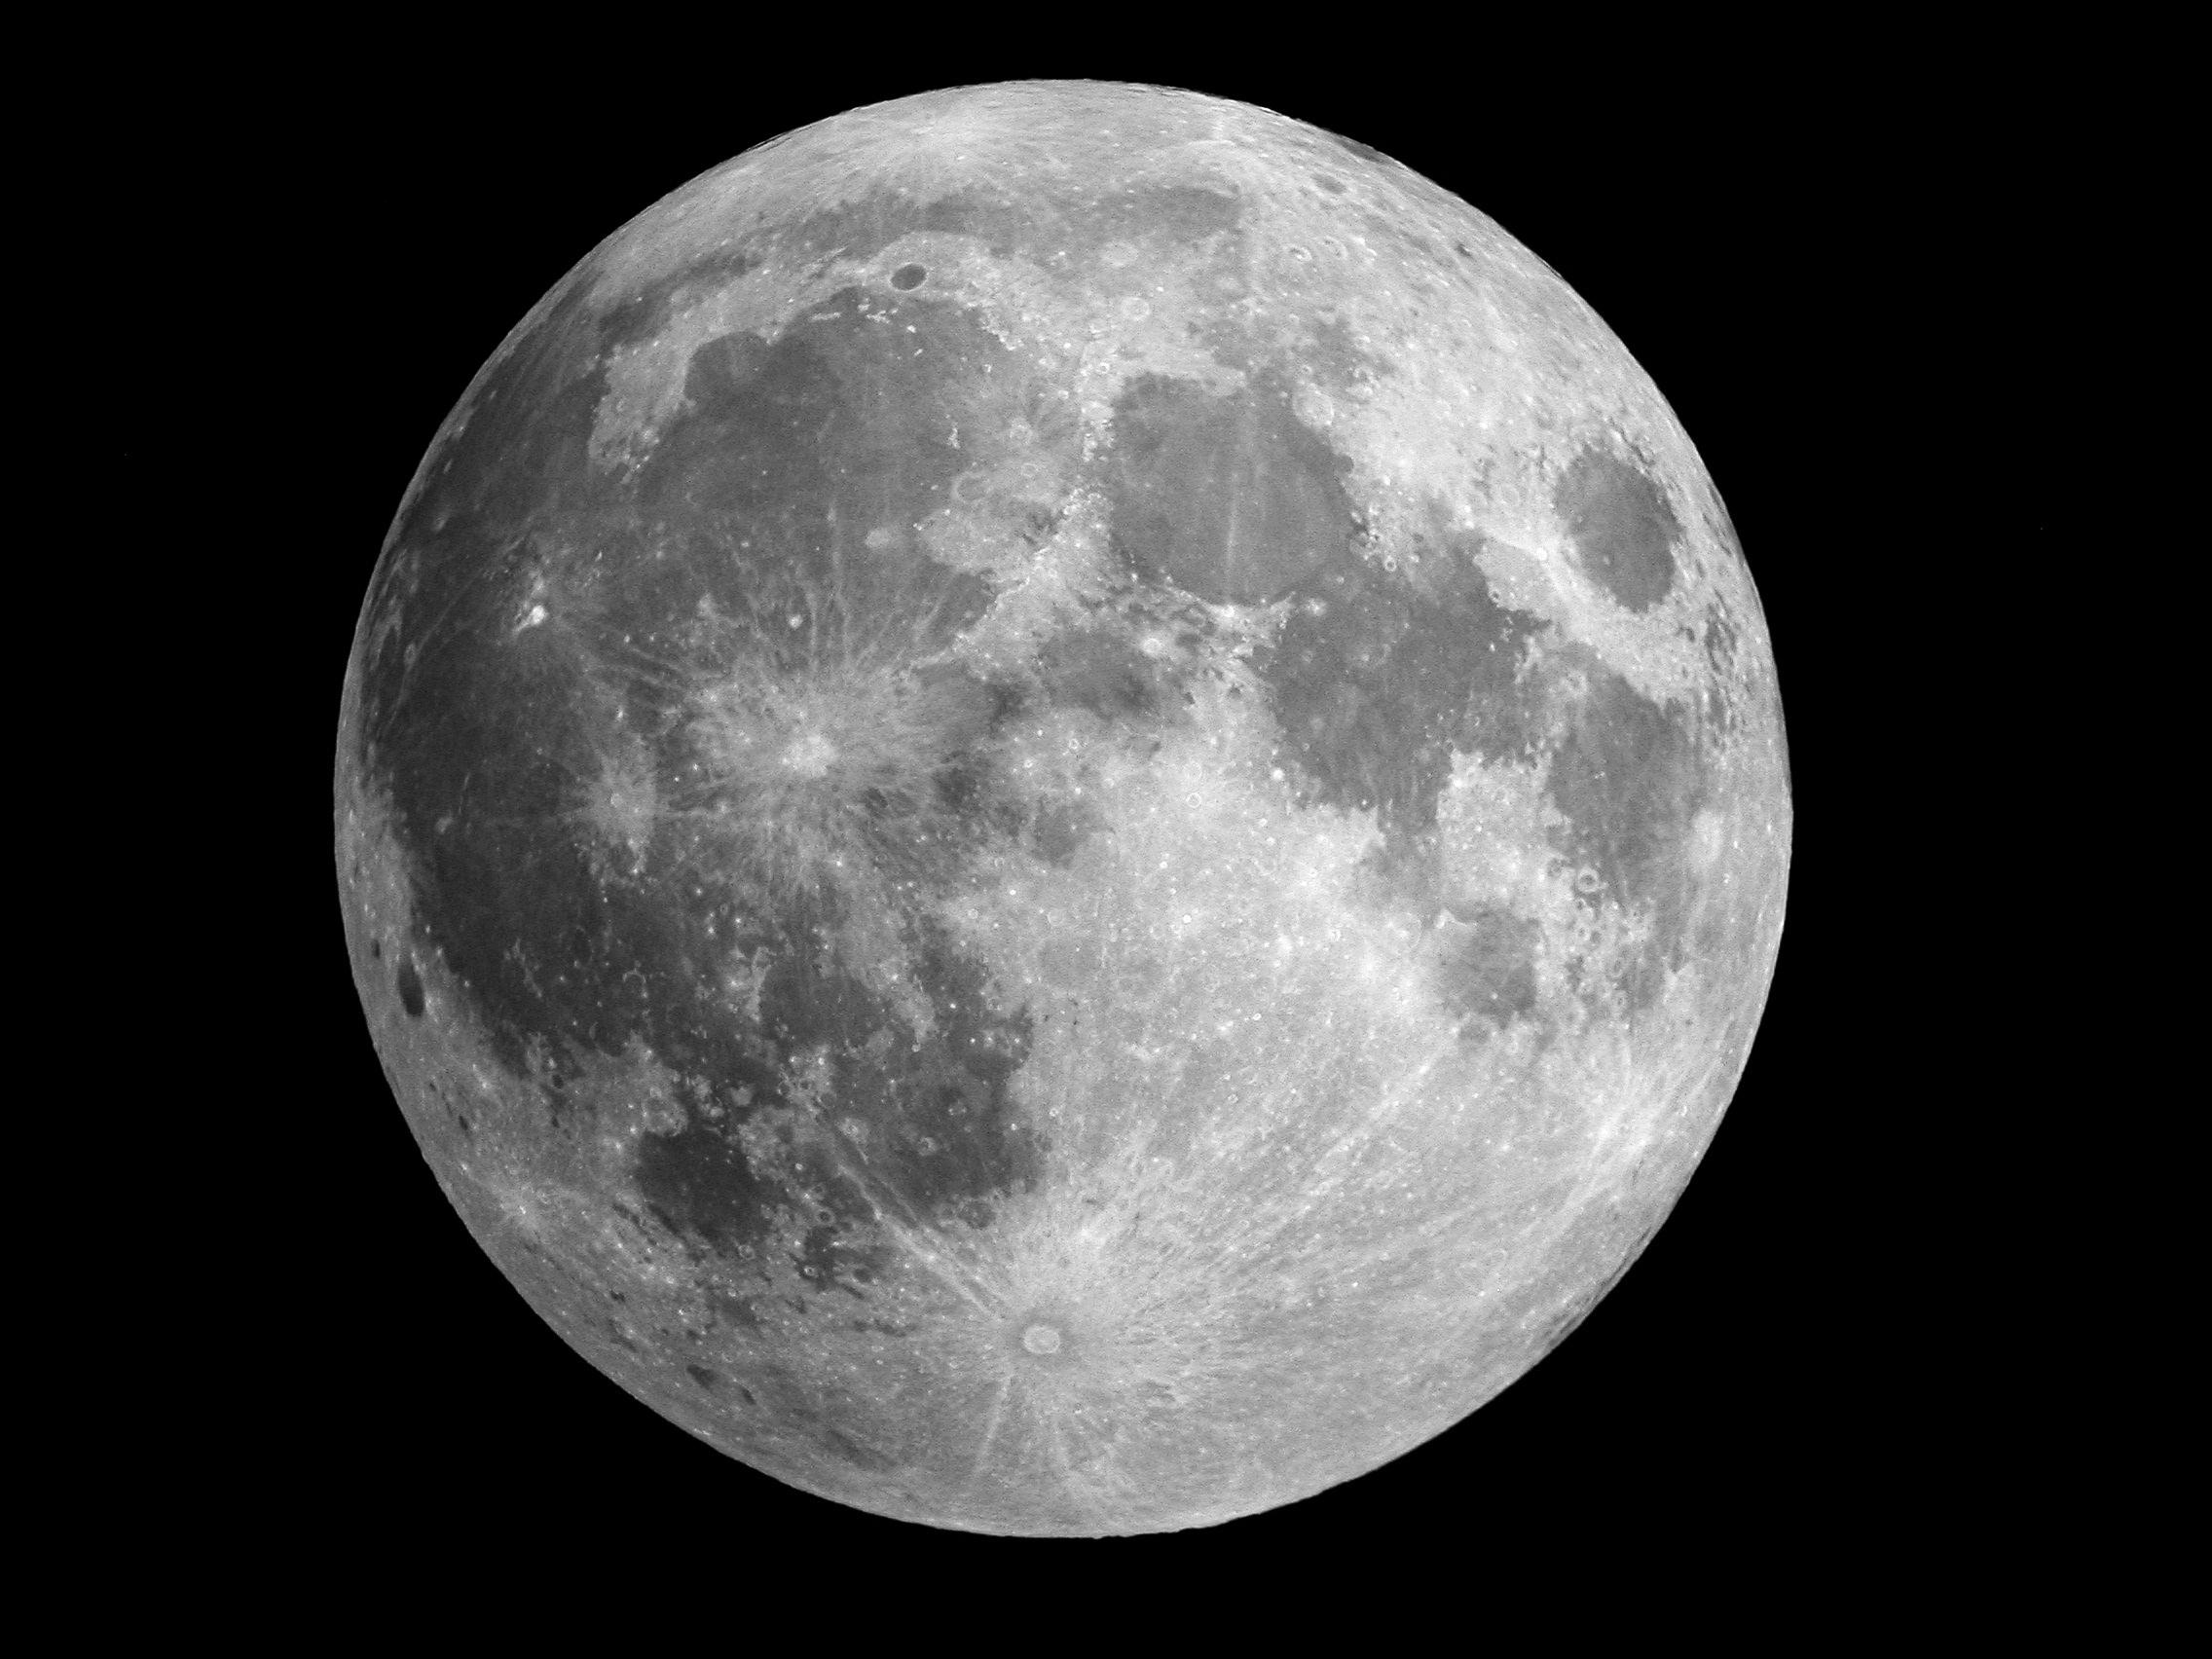 January 29th full moon | 10 Minute Astronomy